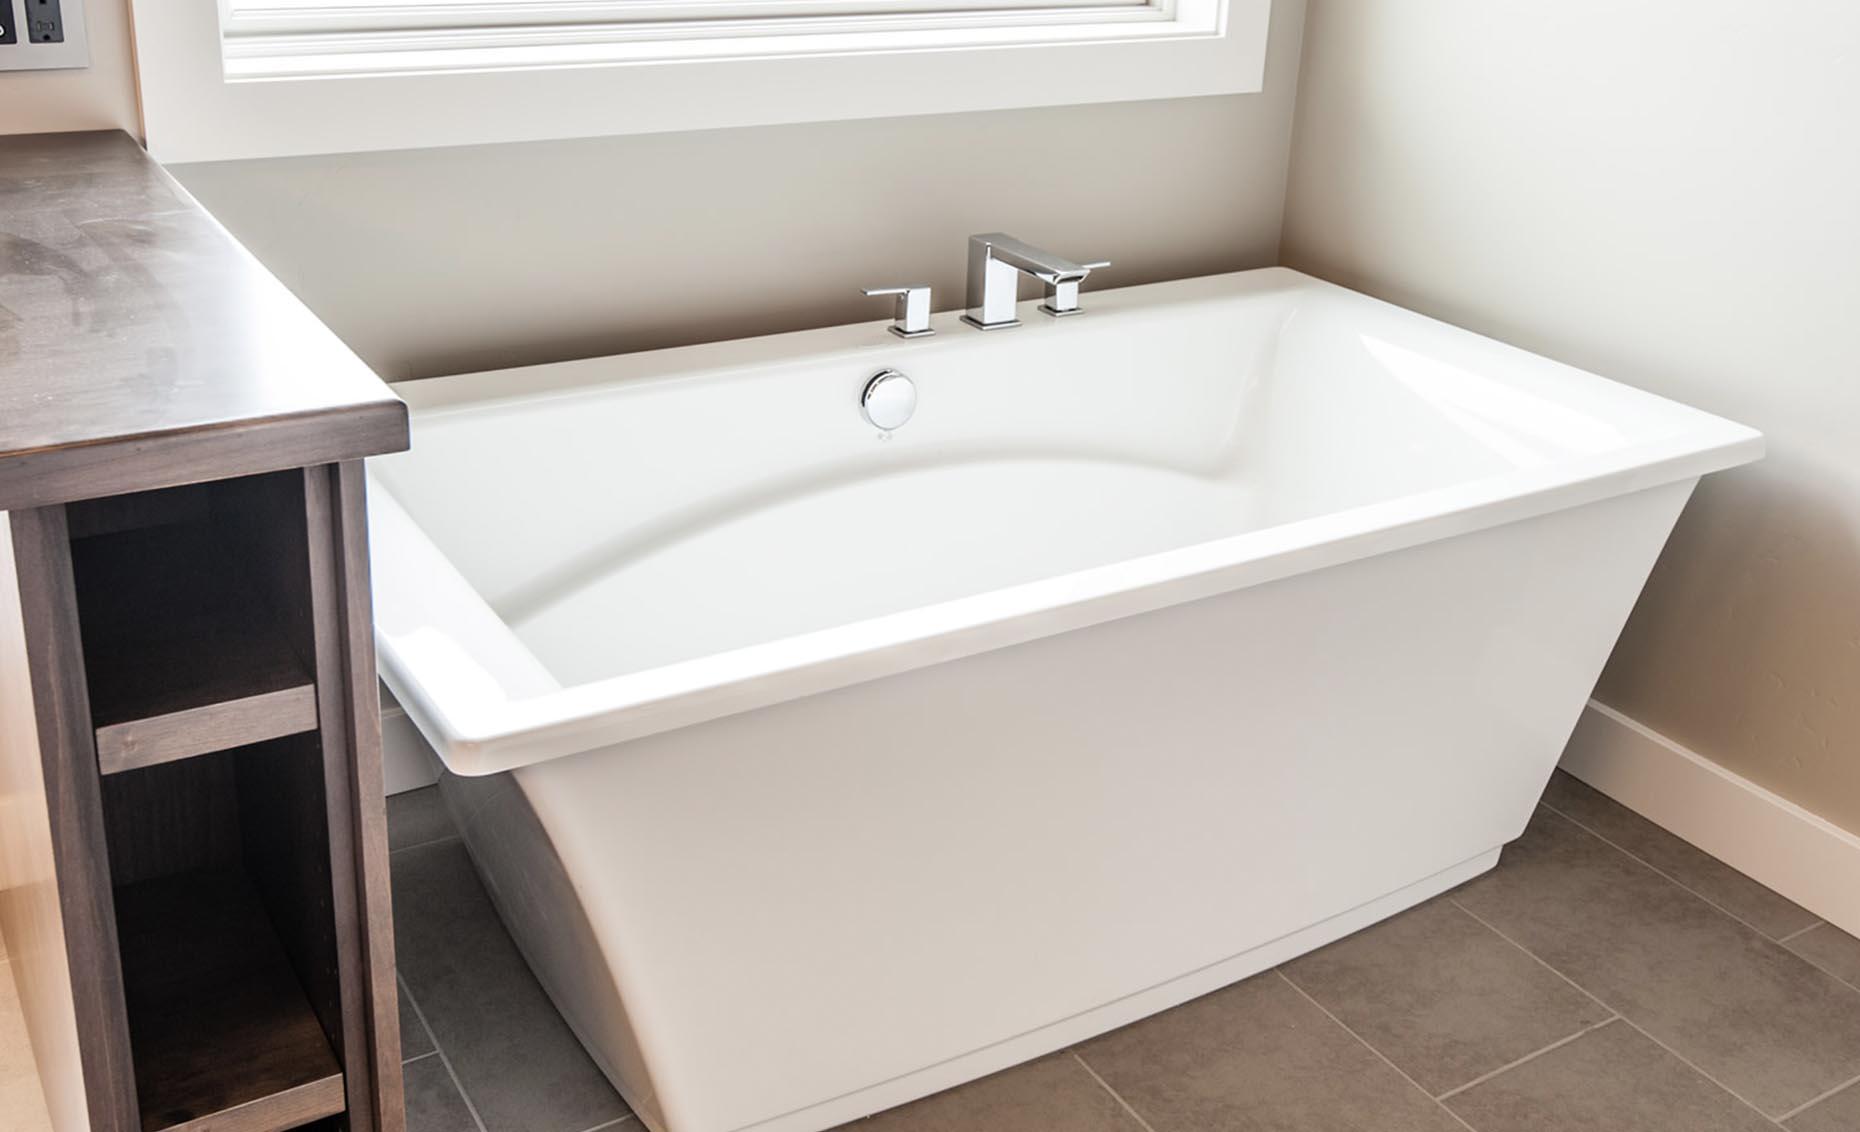 The Corrente Bello House Master Bathroom Bath Tub